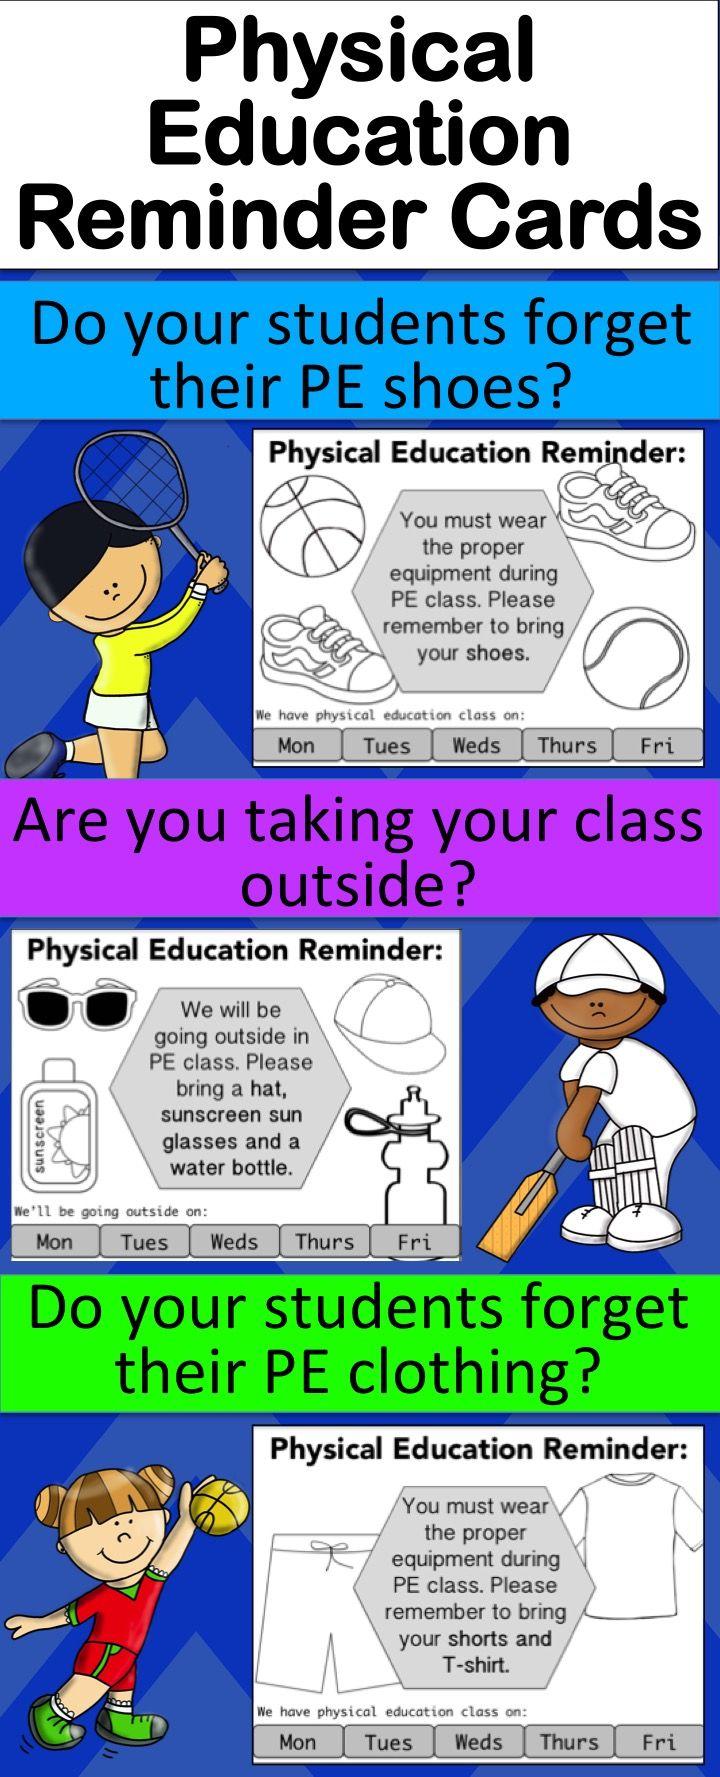 Physical Education Reminder Cards – Shoe Reminder, Clothes Reminder